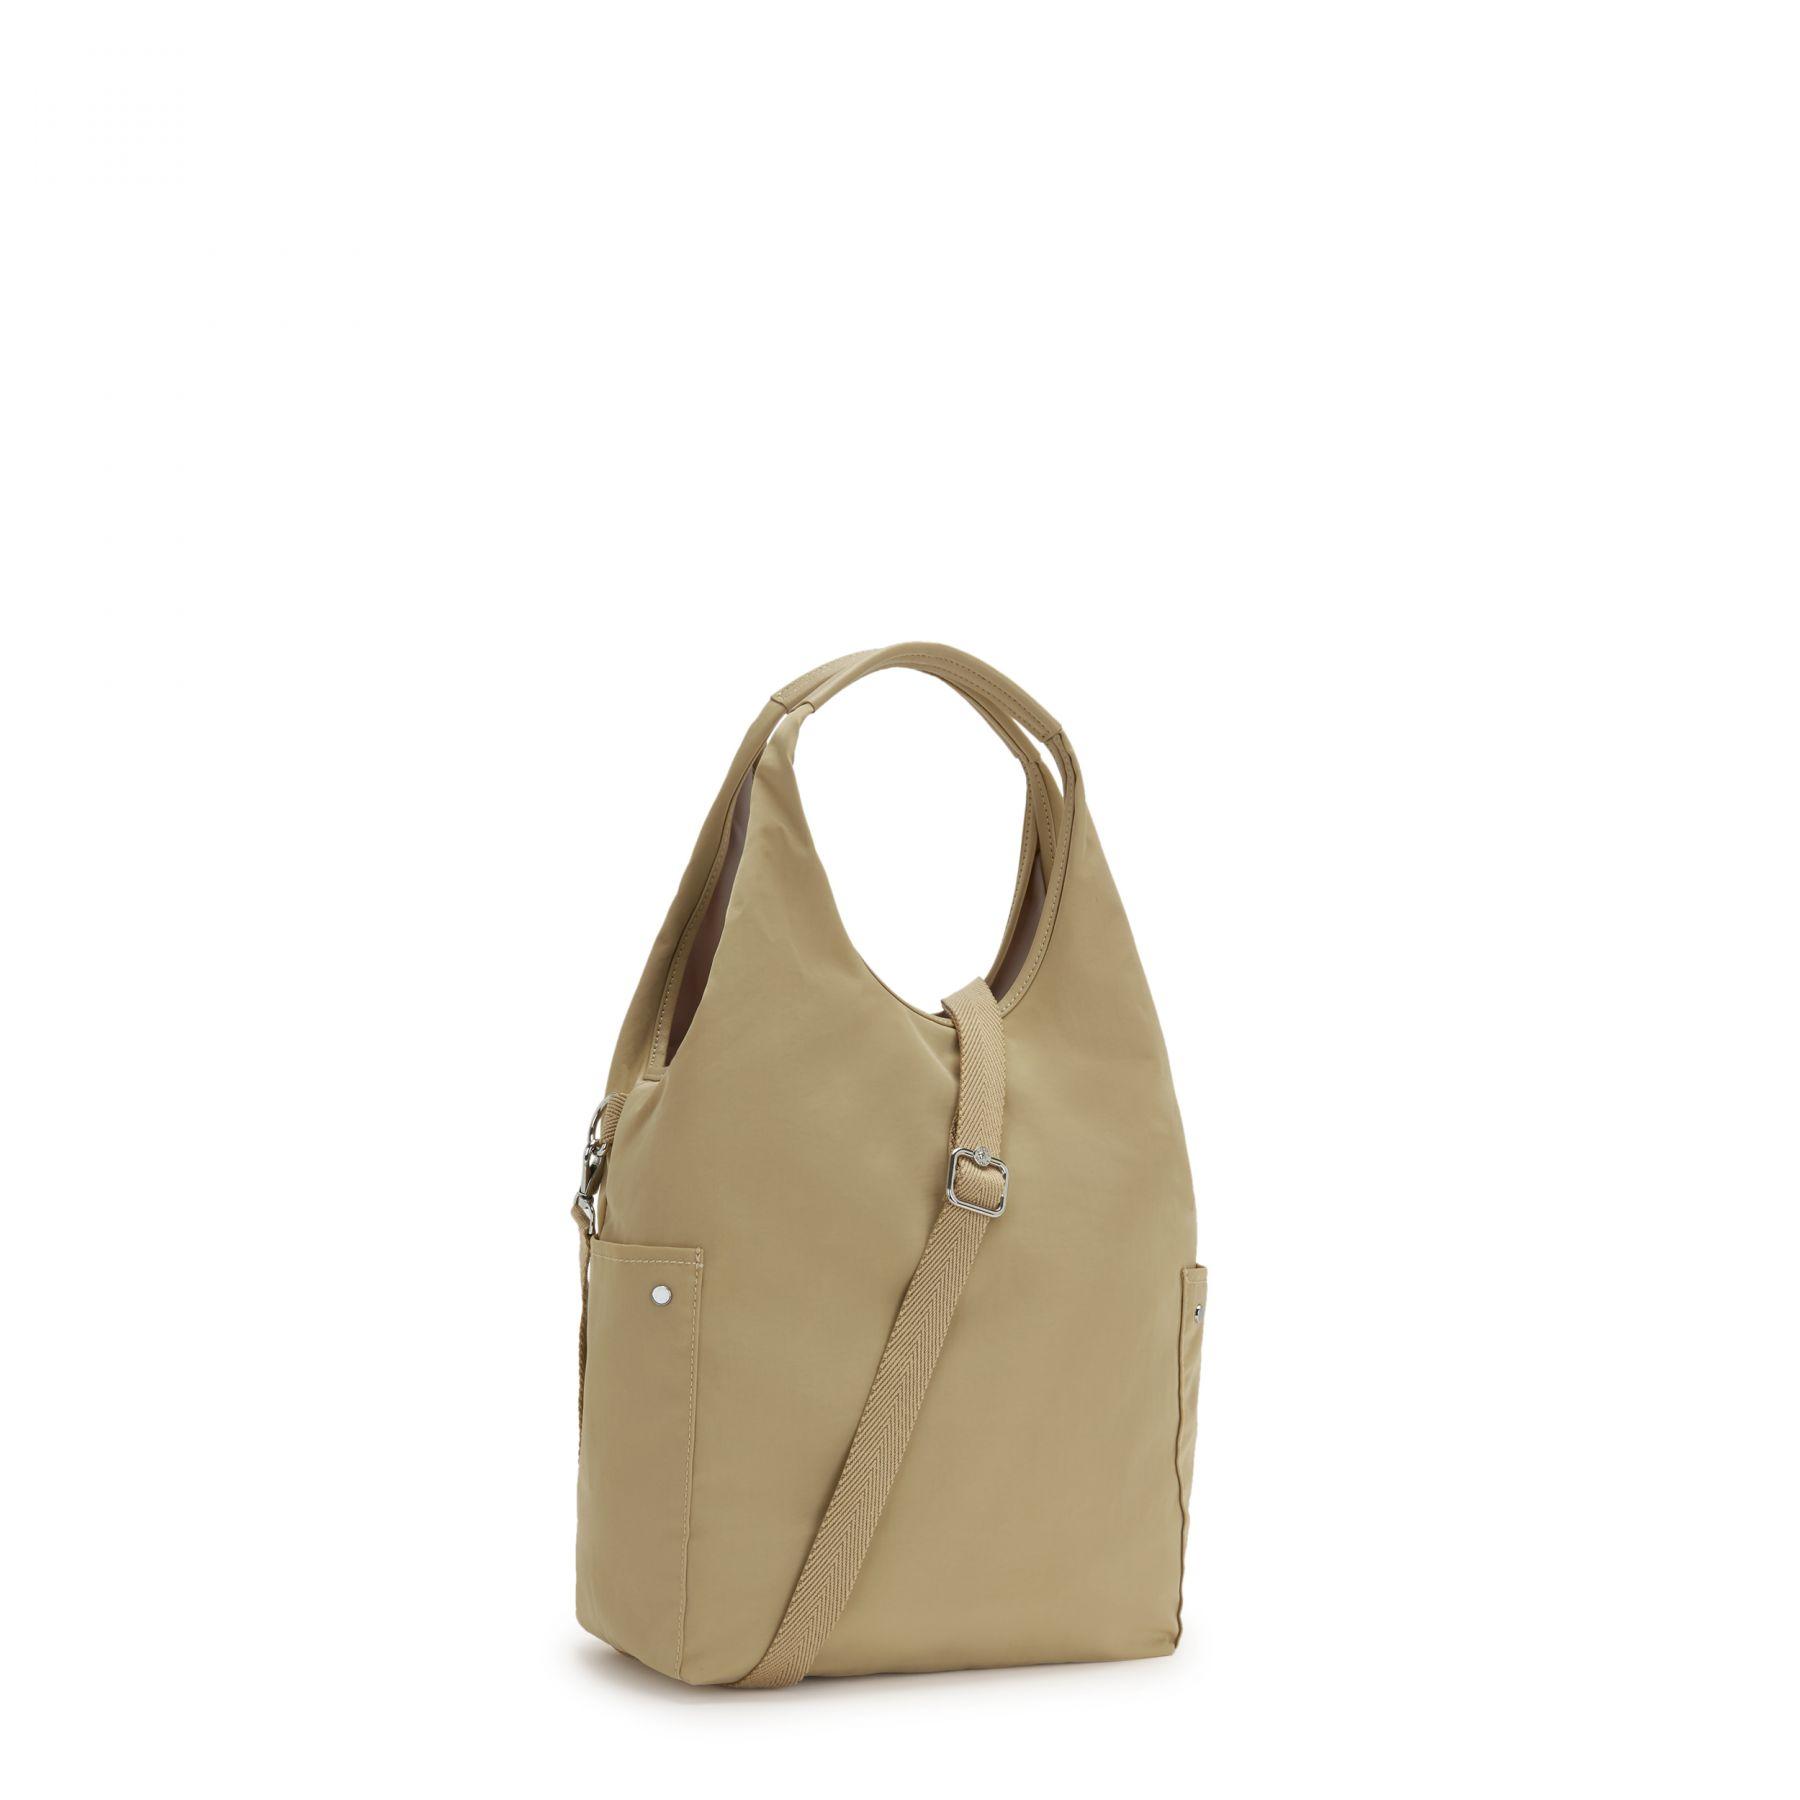 URBANA BAGS by Kipling - Back view